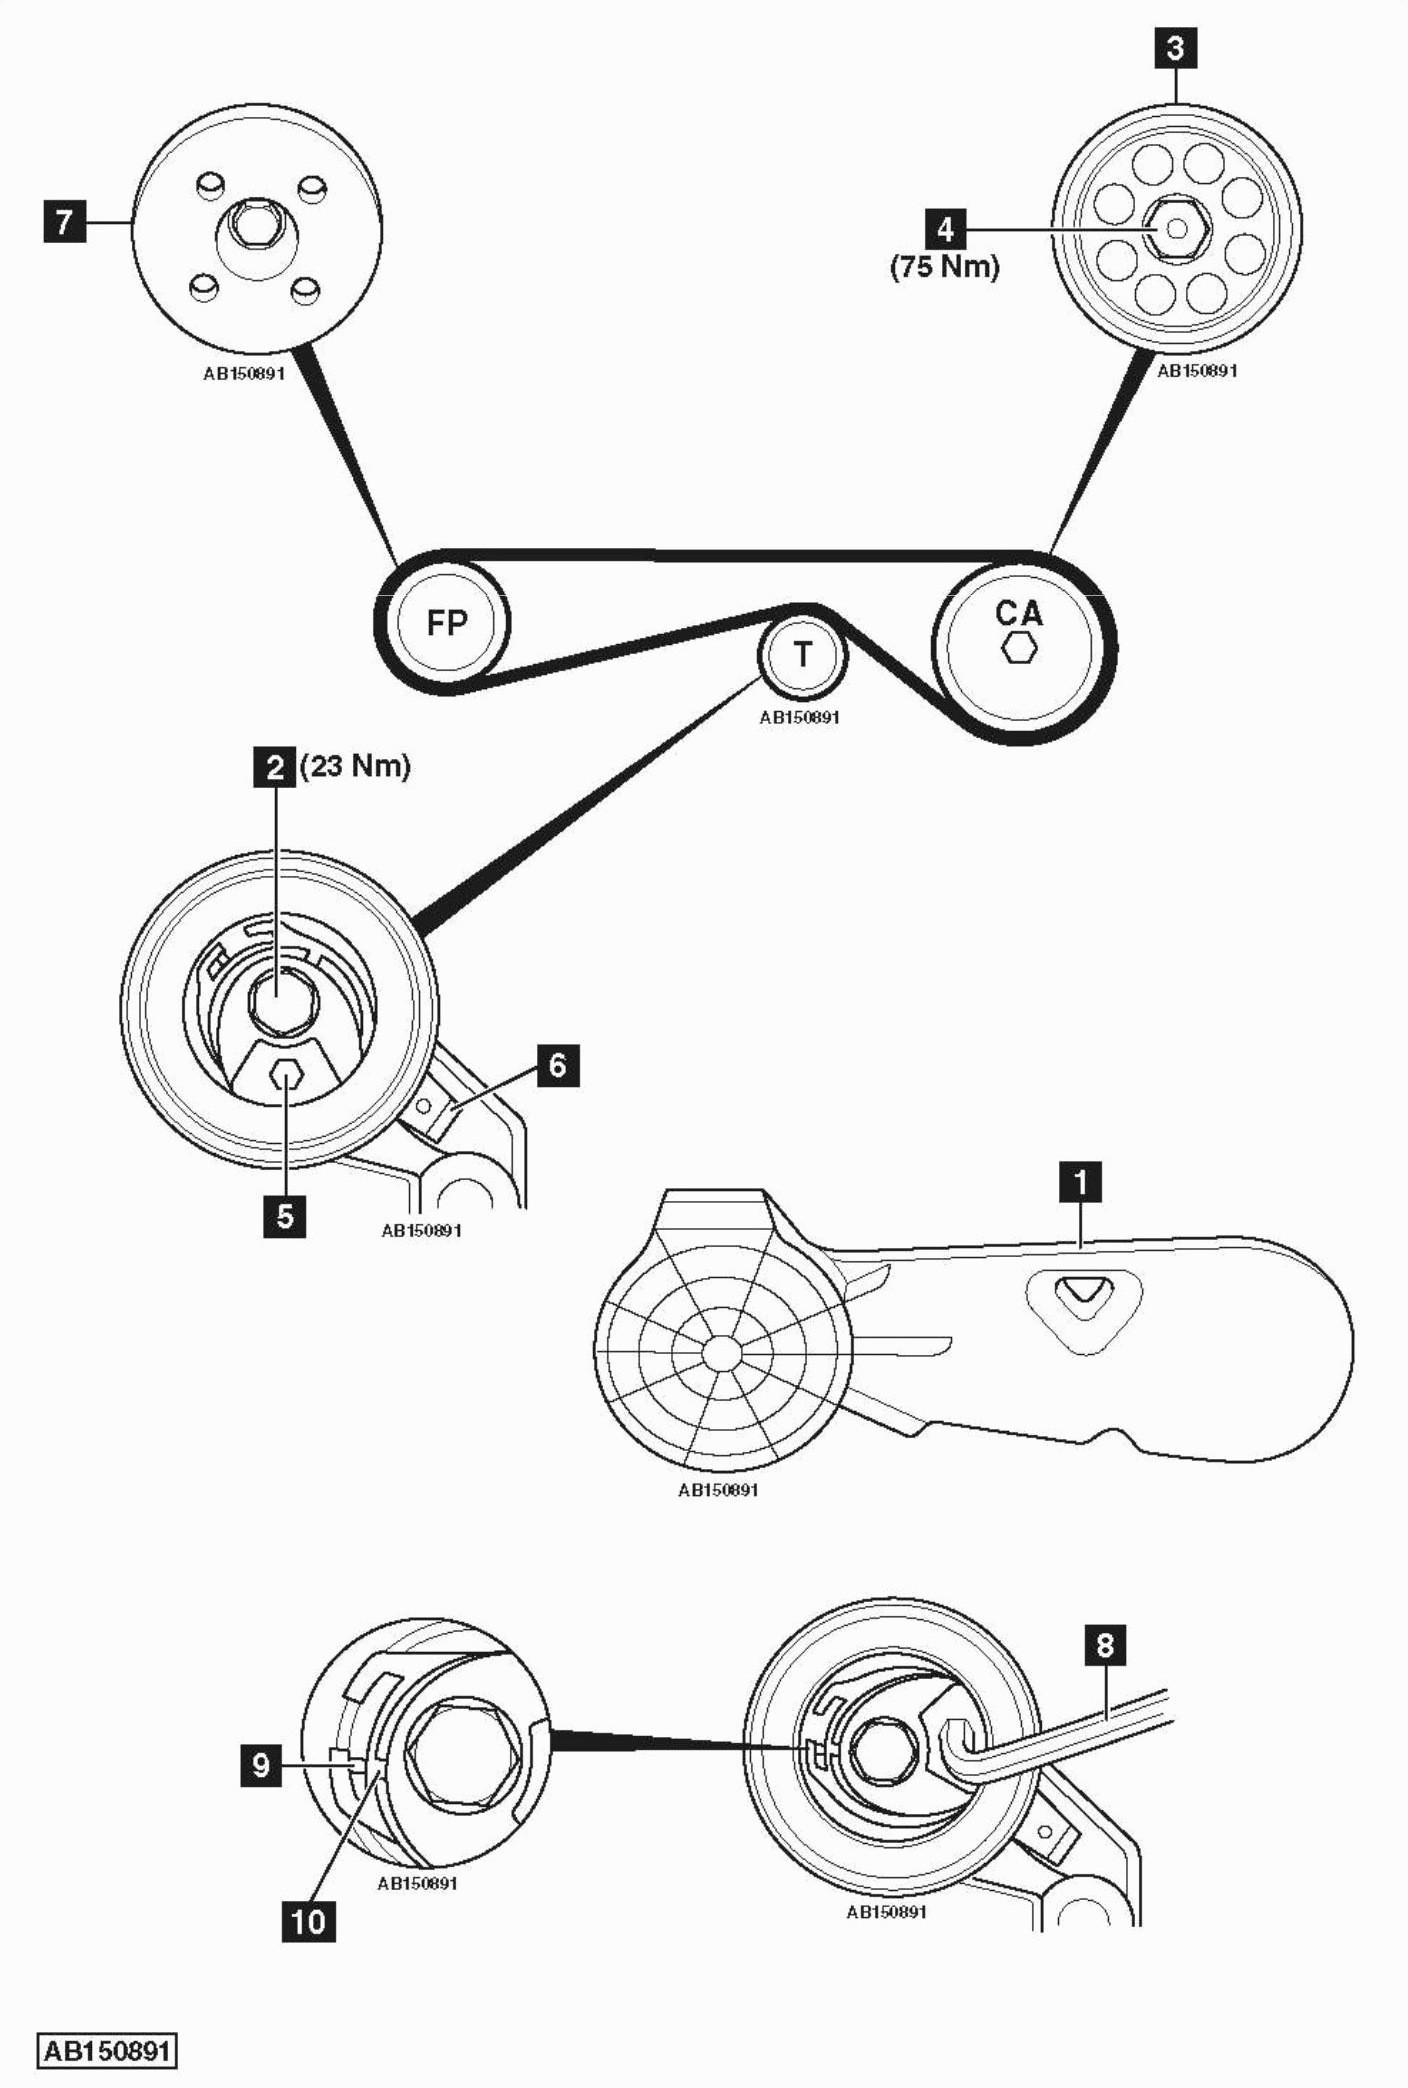 2001 honda accord engine diagram 1996 honda accord